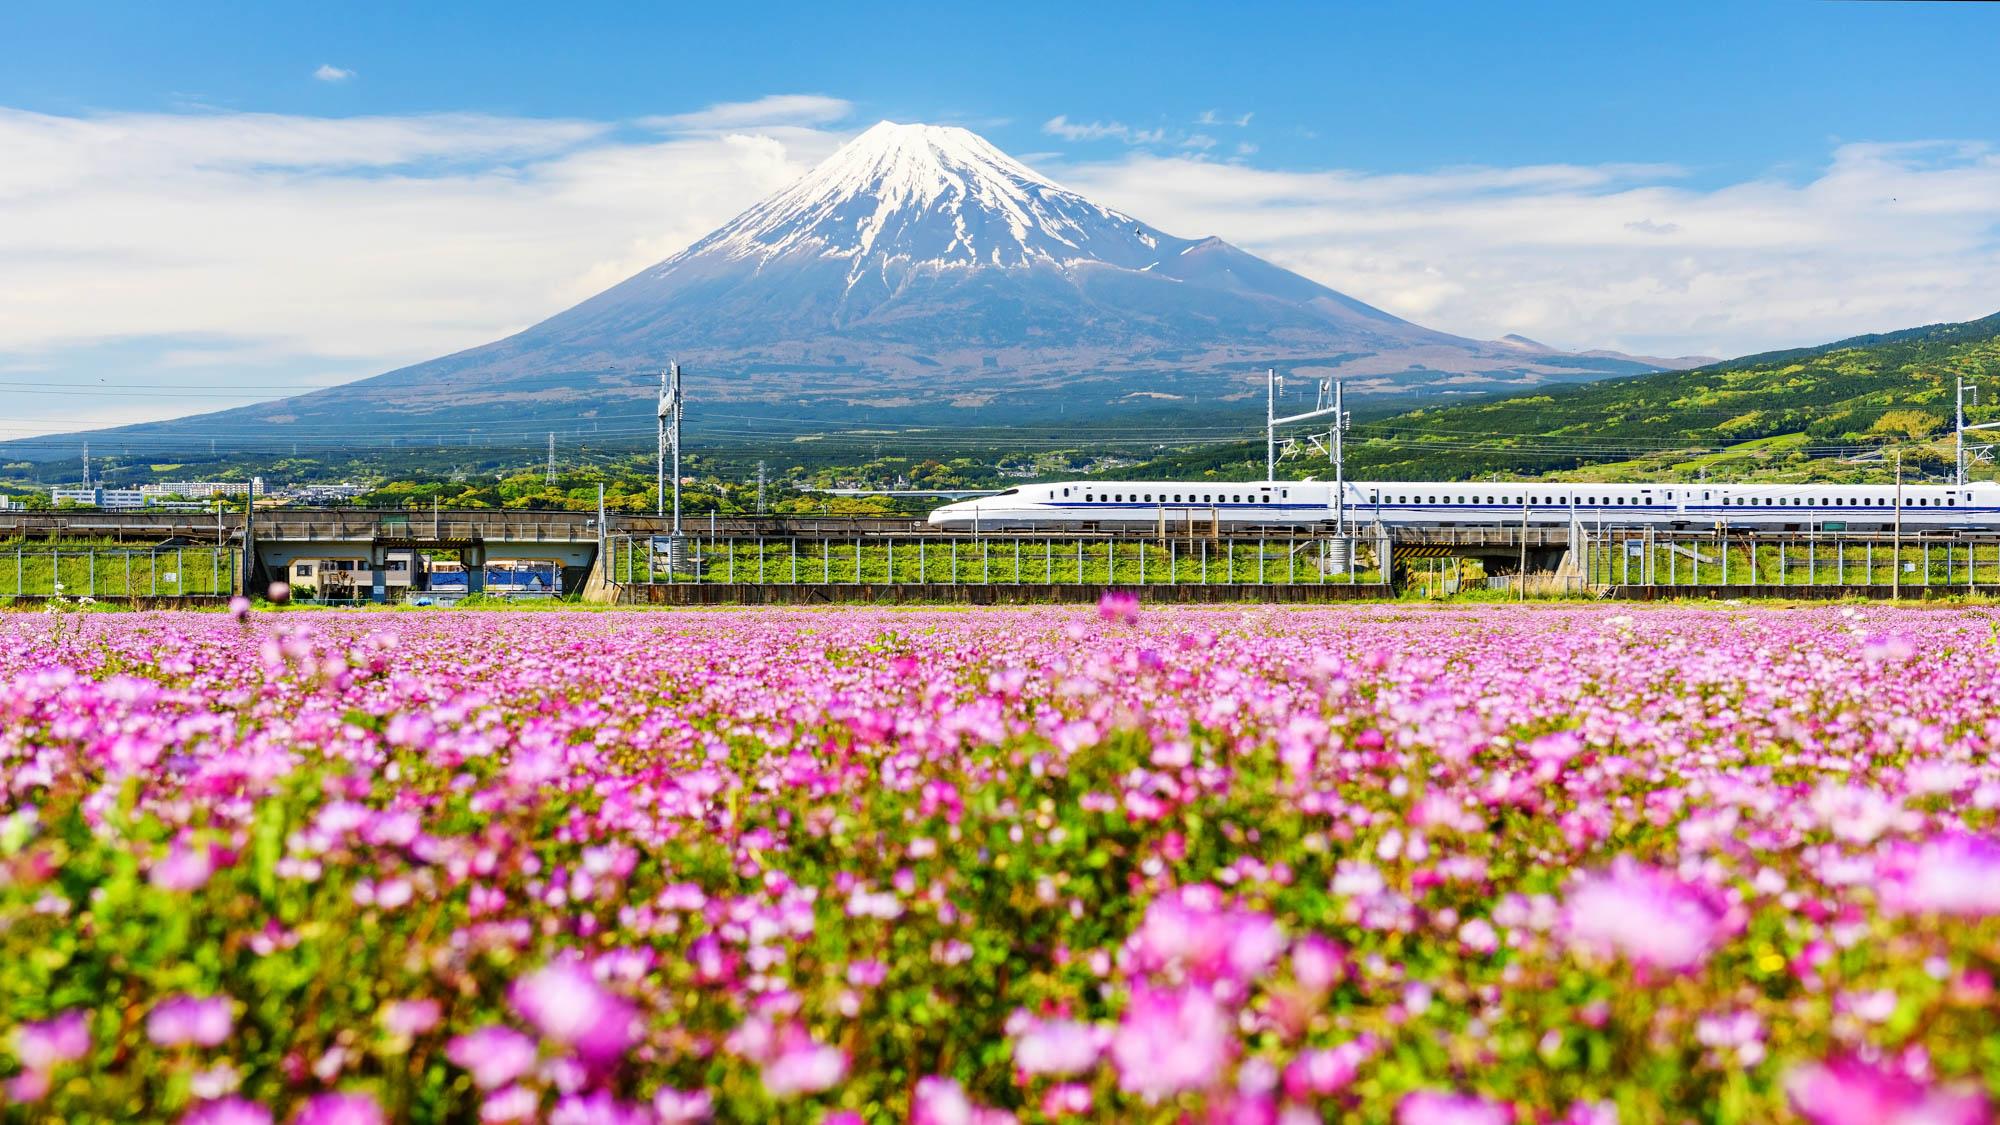 Shinkanzen or 'Bullet train' passes Mt. Fuji and Shibazakura during Spring, Shizuoka, Japan